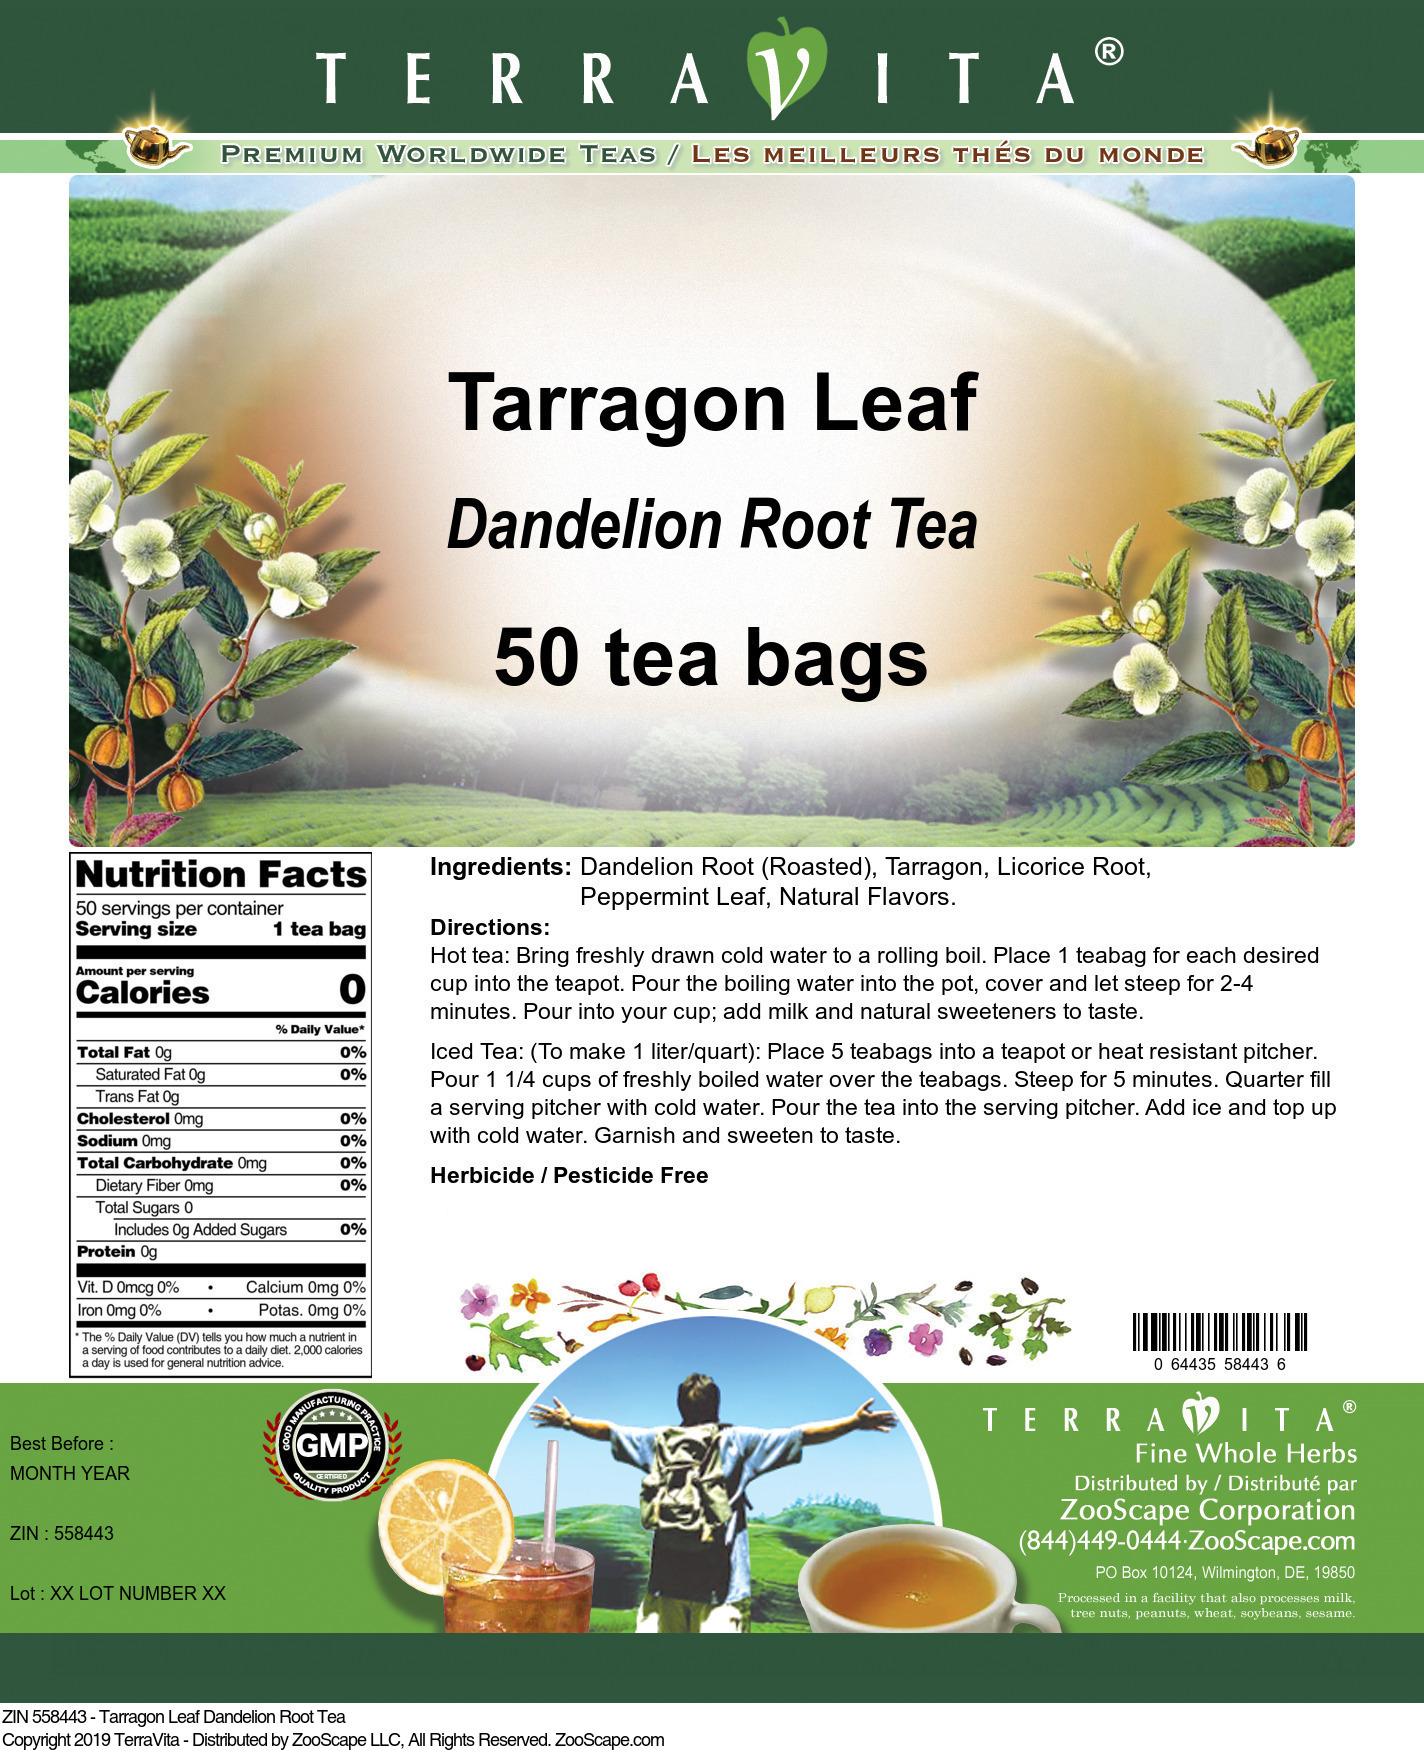 Tarragon Leaf Dandelion Root